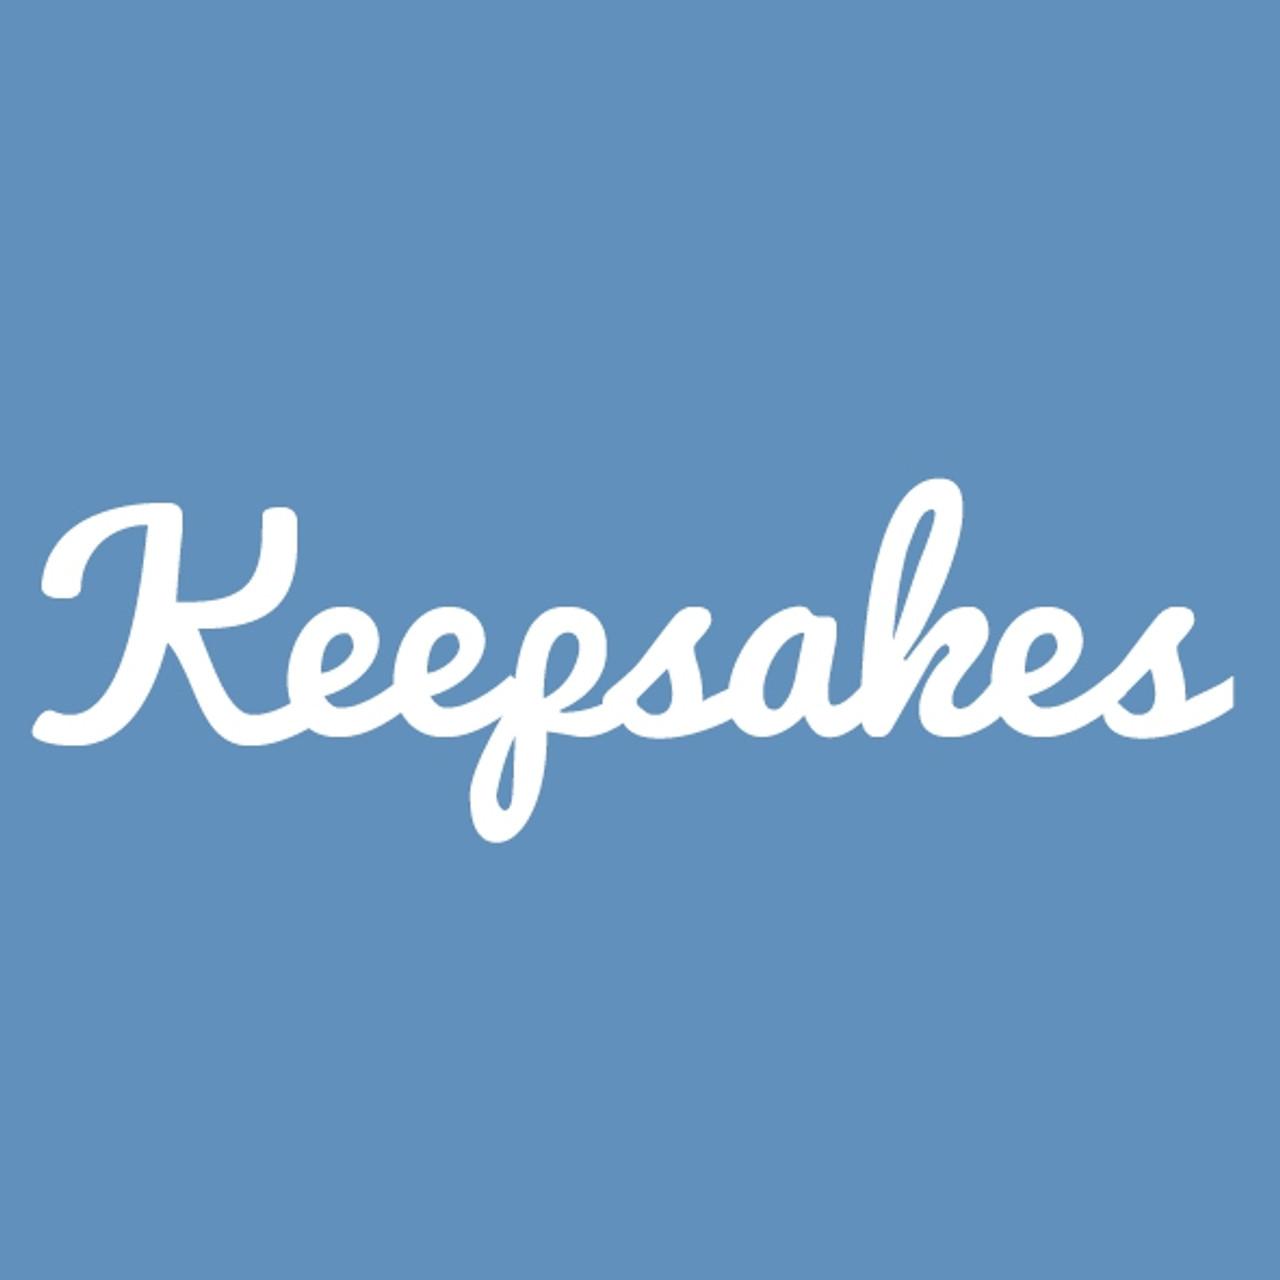 50th Birthday Keepsakes